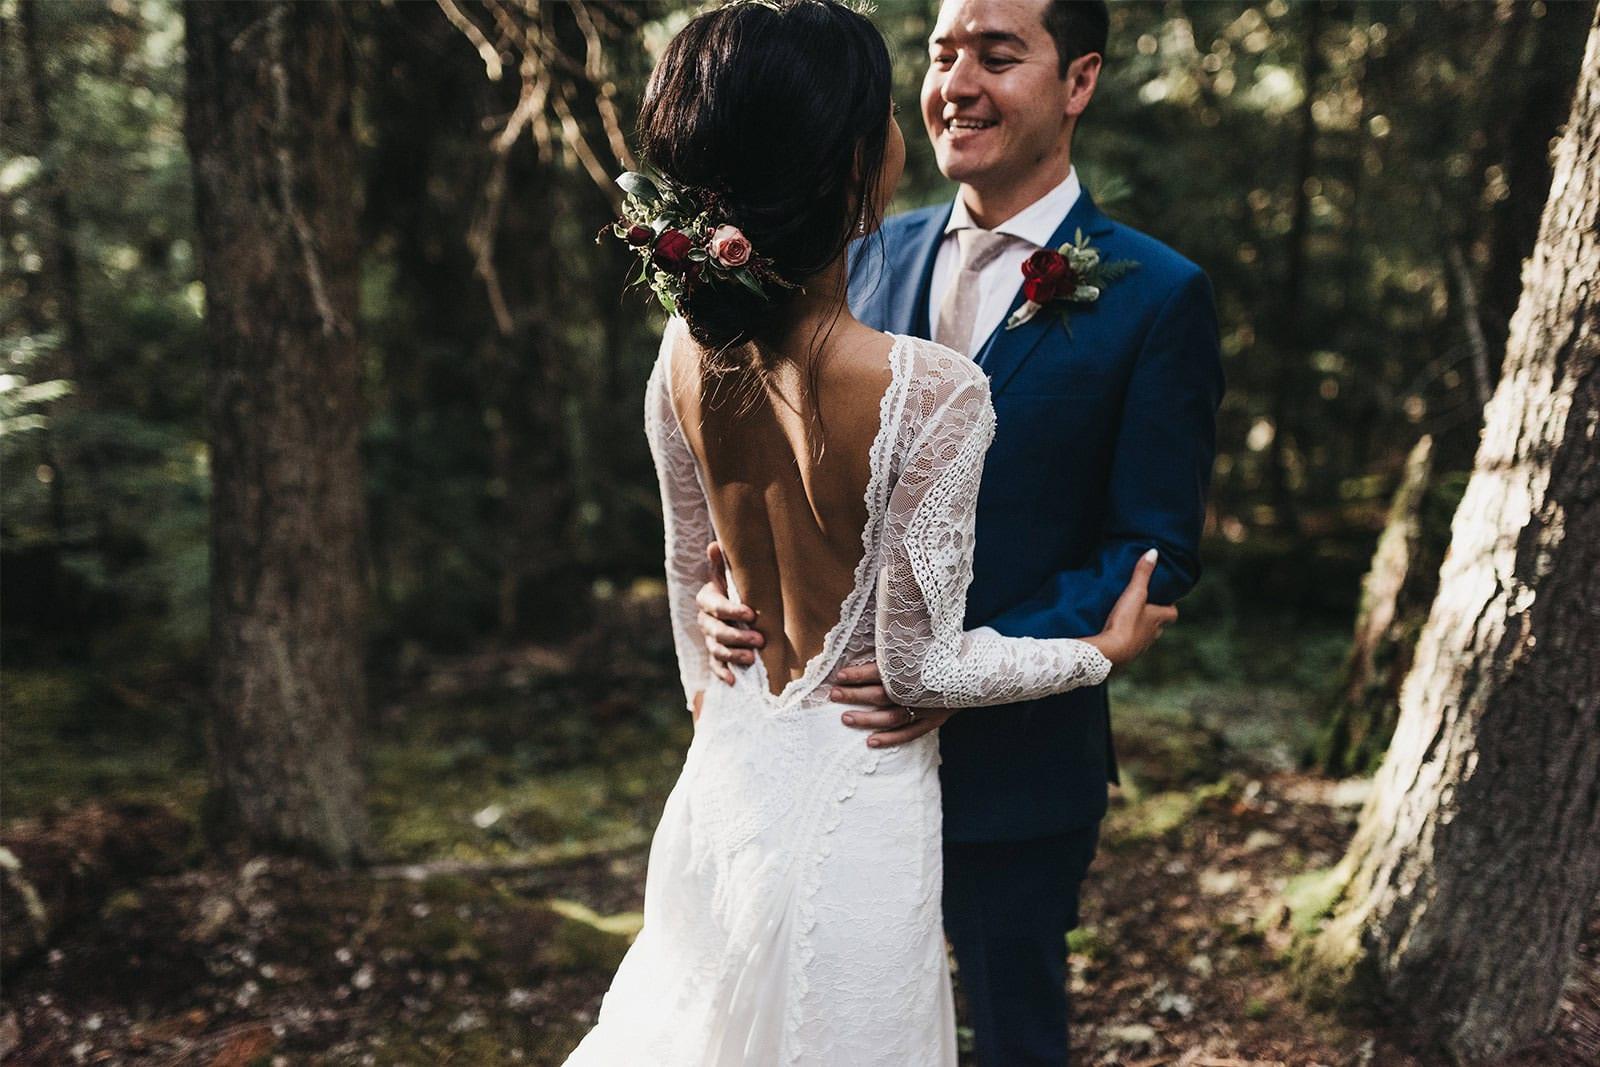 Bride wearing Grace Loves Lace Inca Gown being held by groom